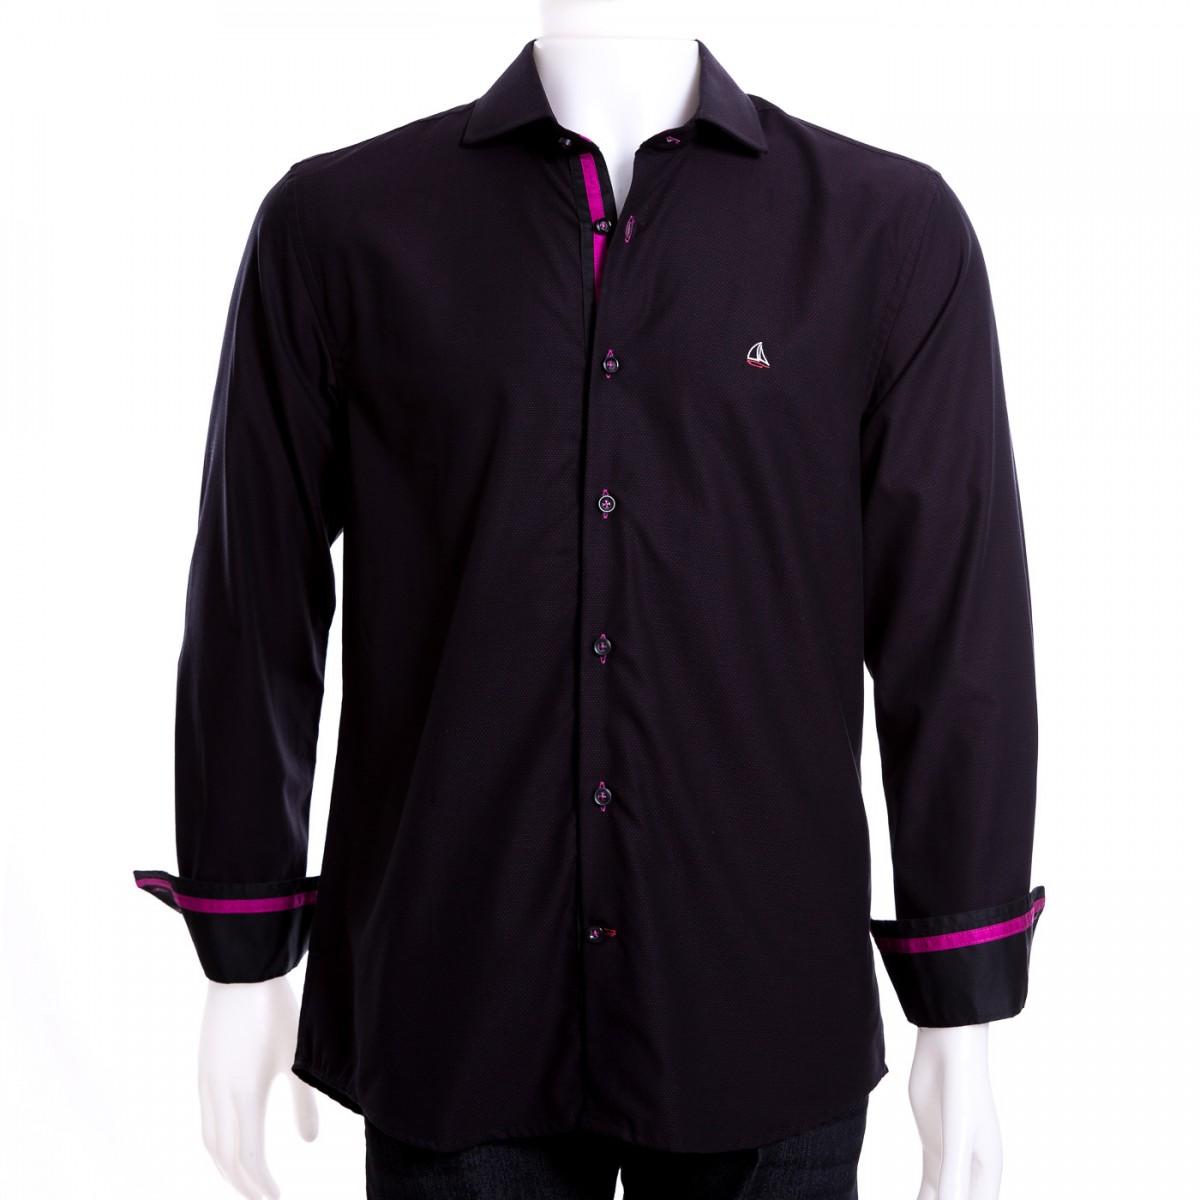 34aa373402 Bizz Store - Camisa Social Masculina Porto CO Slim Fit Marinho